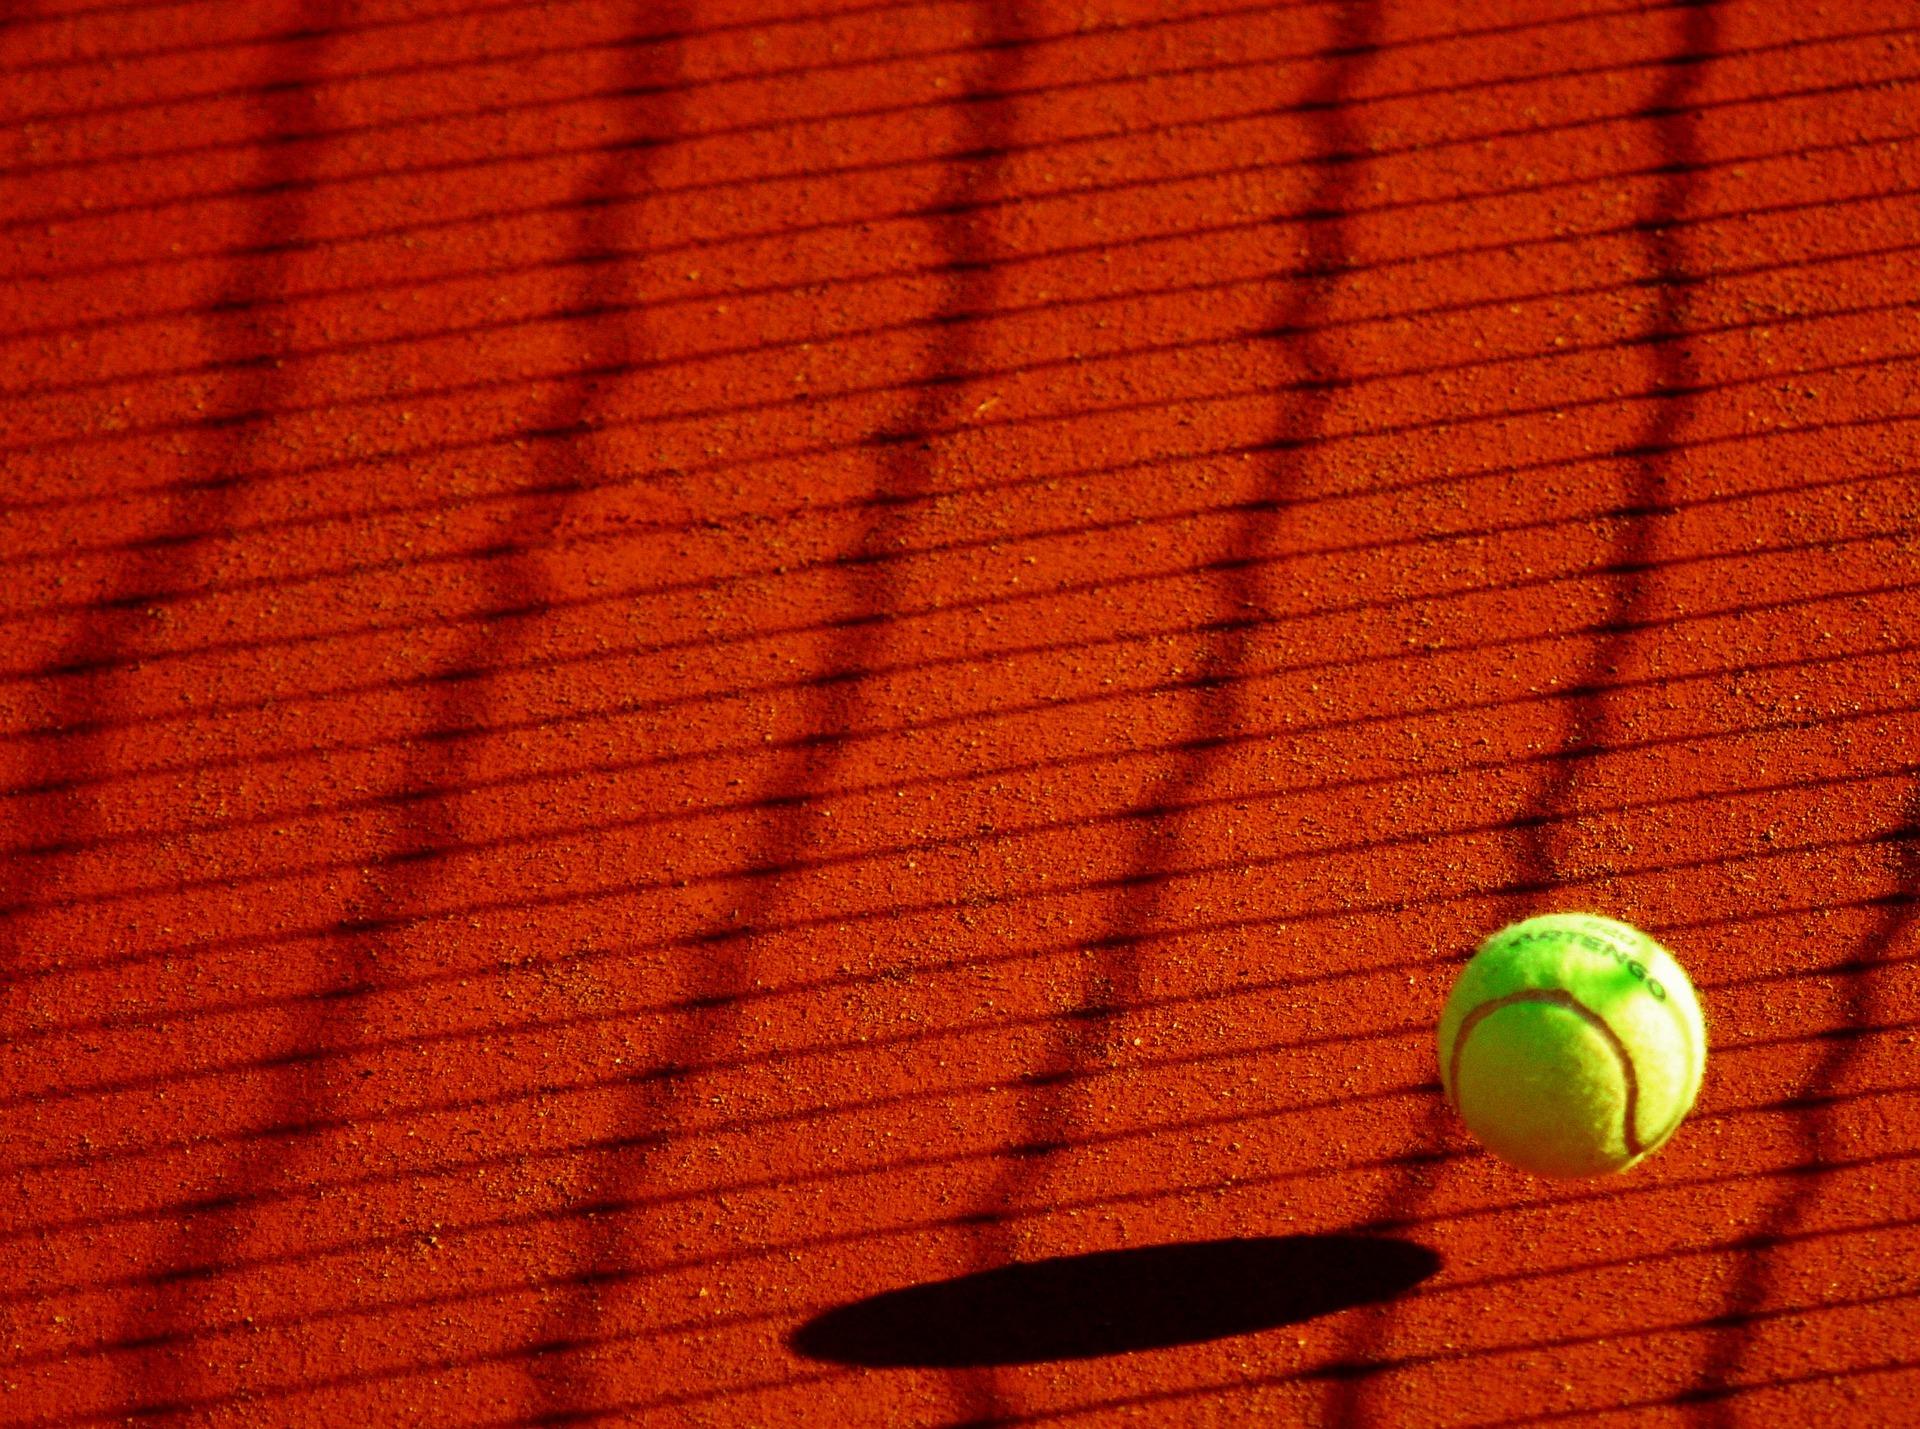 Tennisball auf rotem Platz